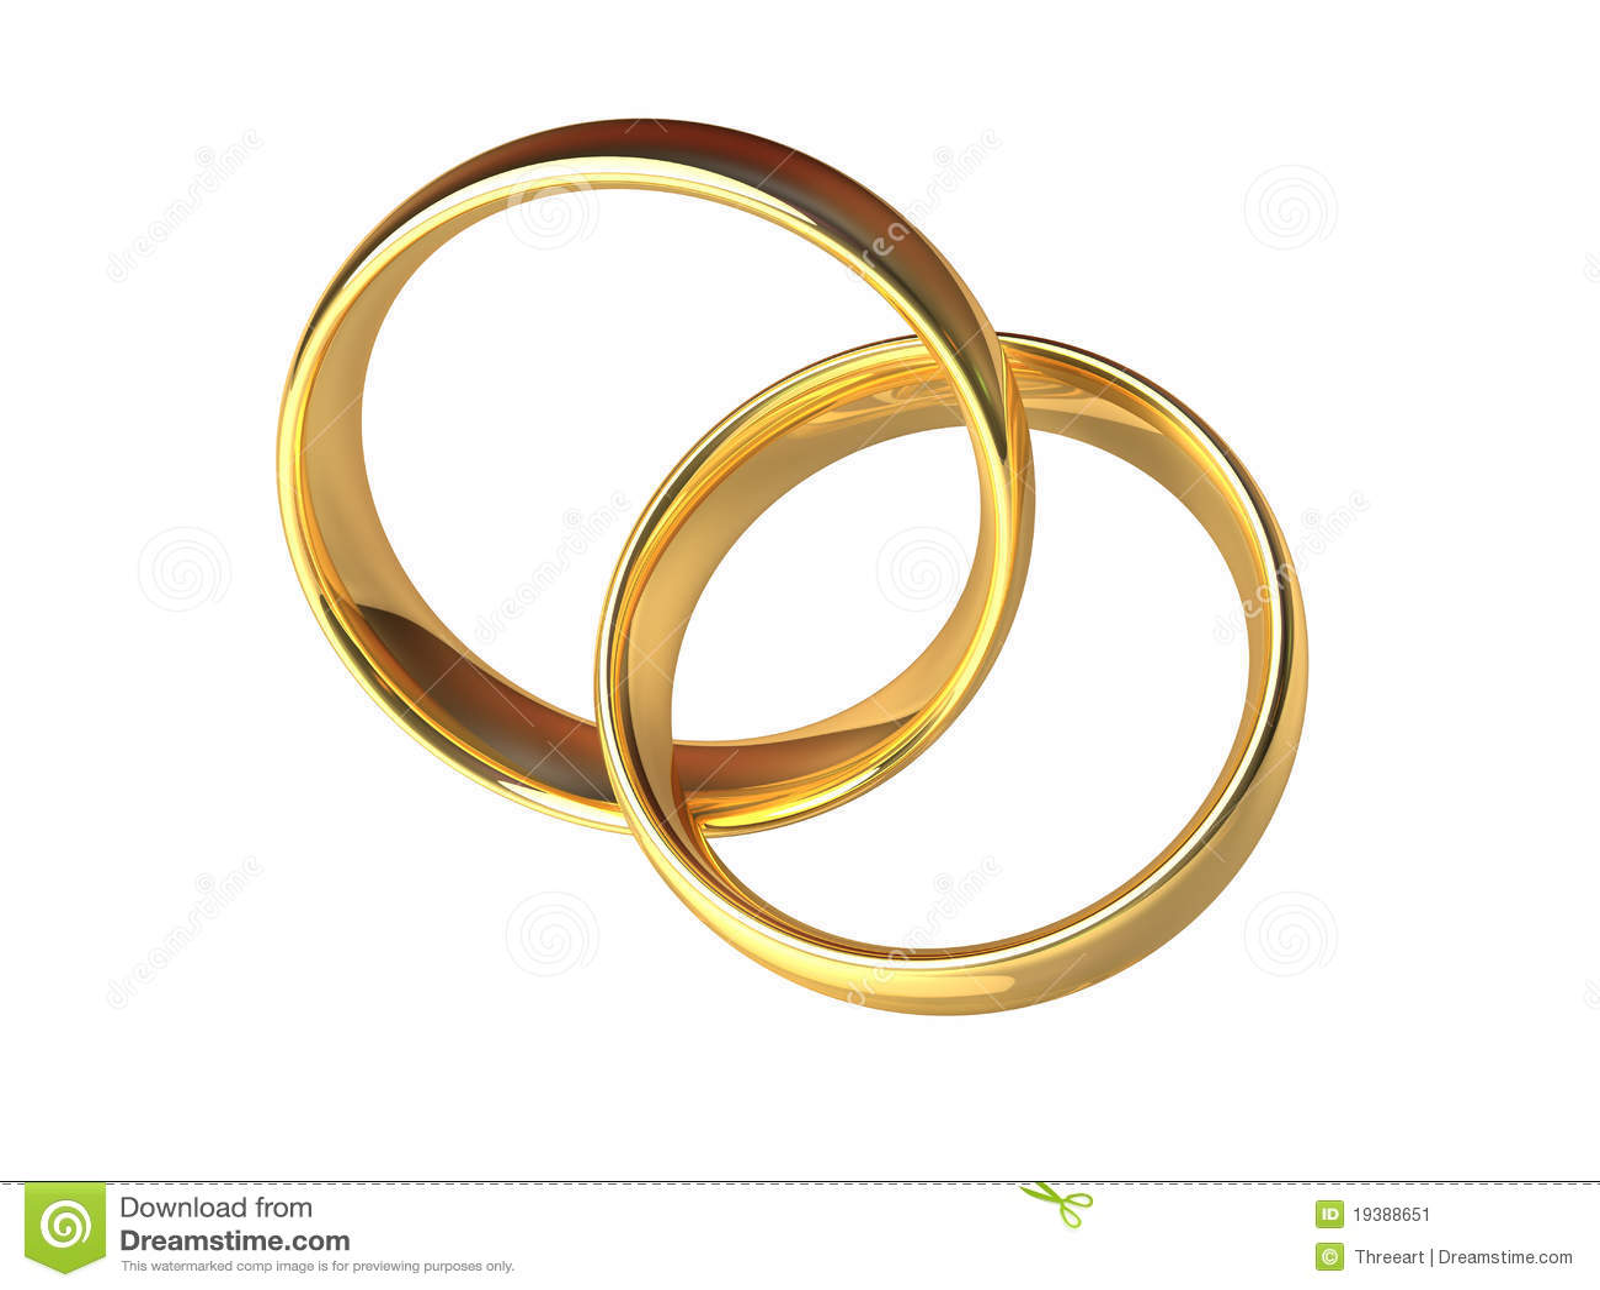 Two Interlocked Wedding Rings Png